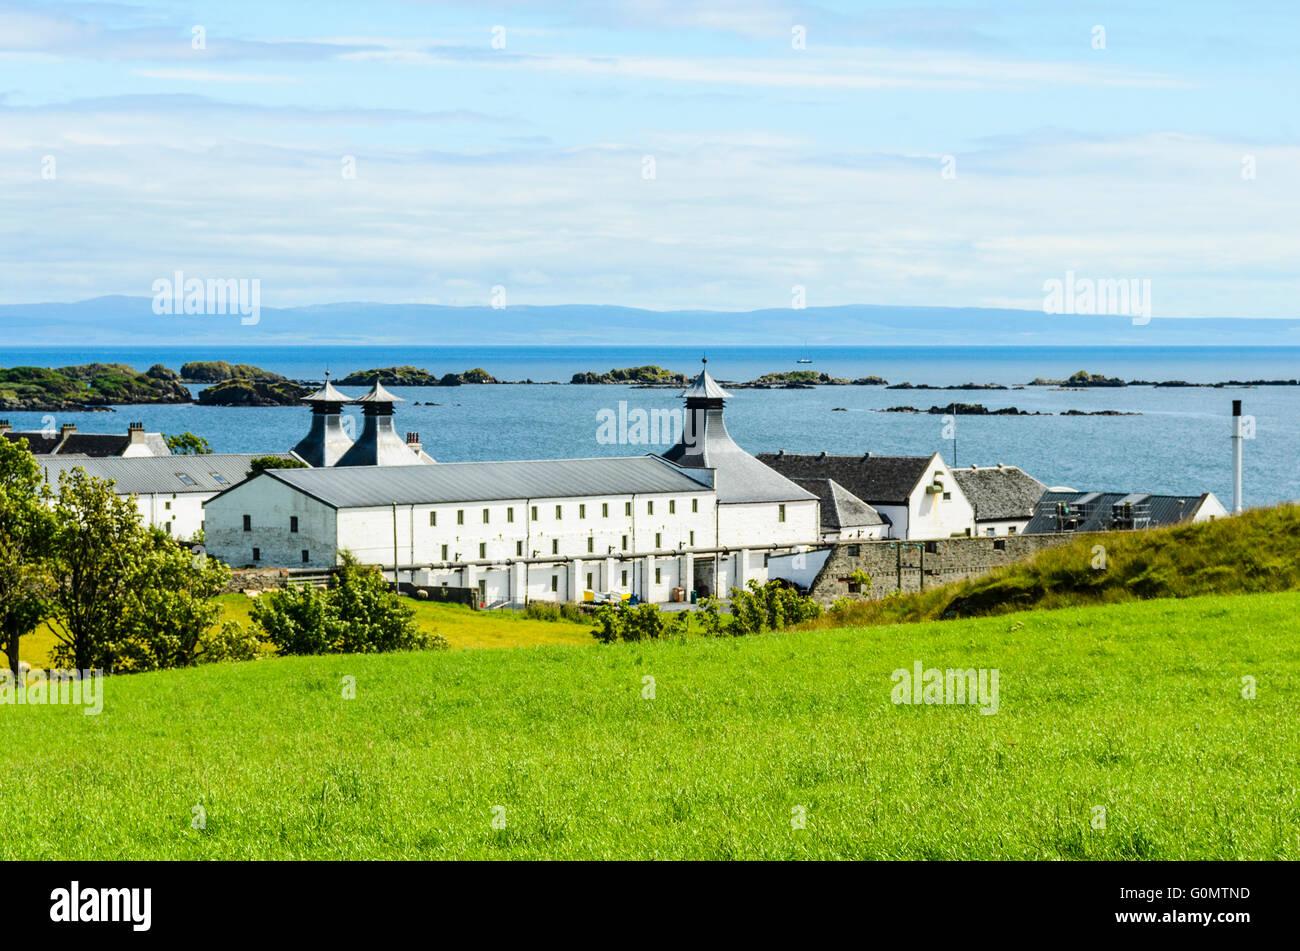 Ardbeg distillery on the island of Islay Scotland - Stock Image